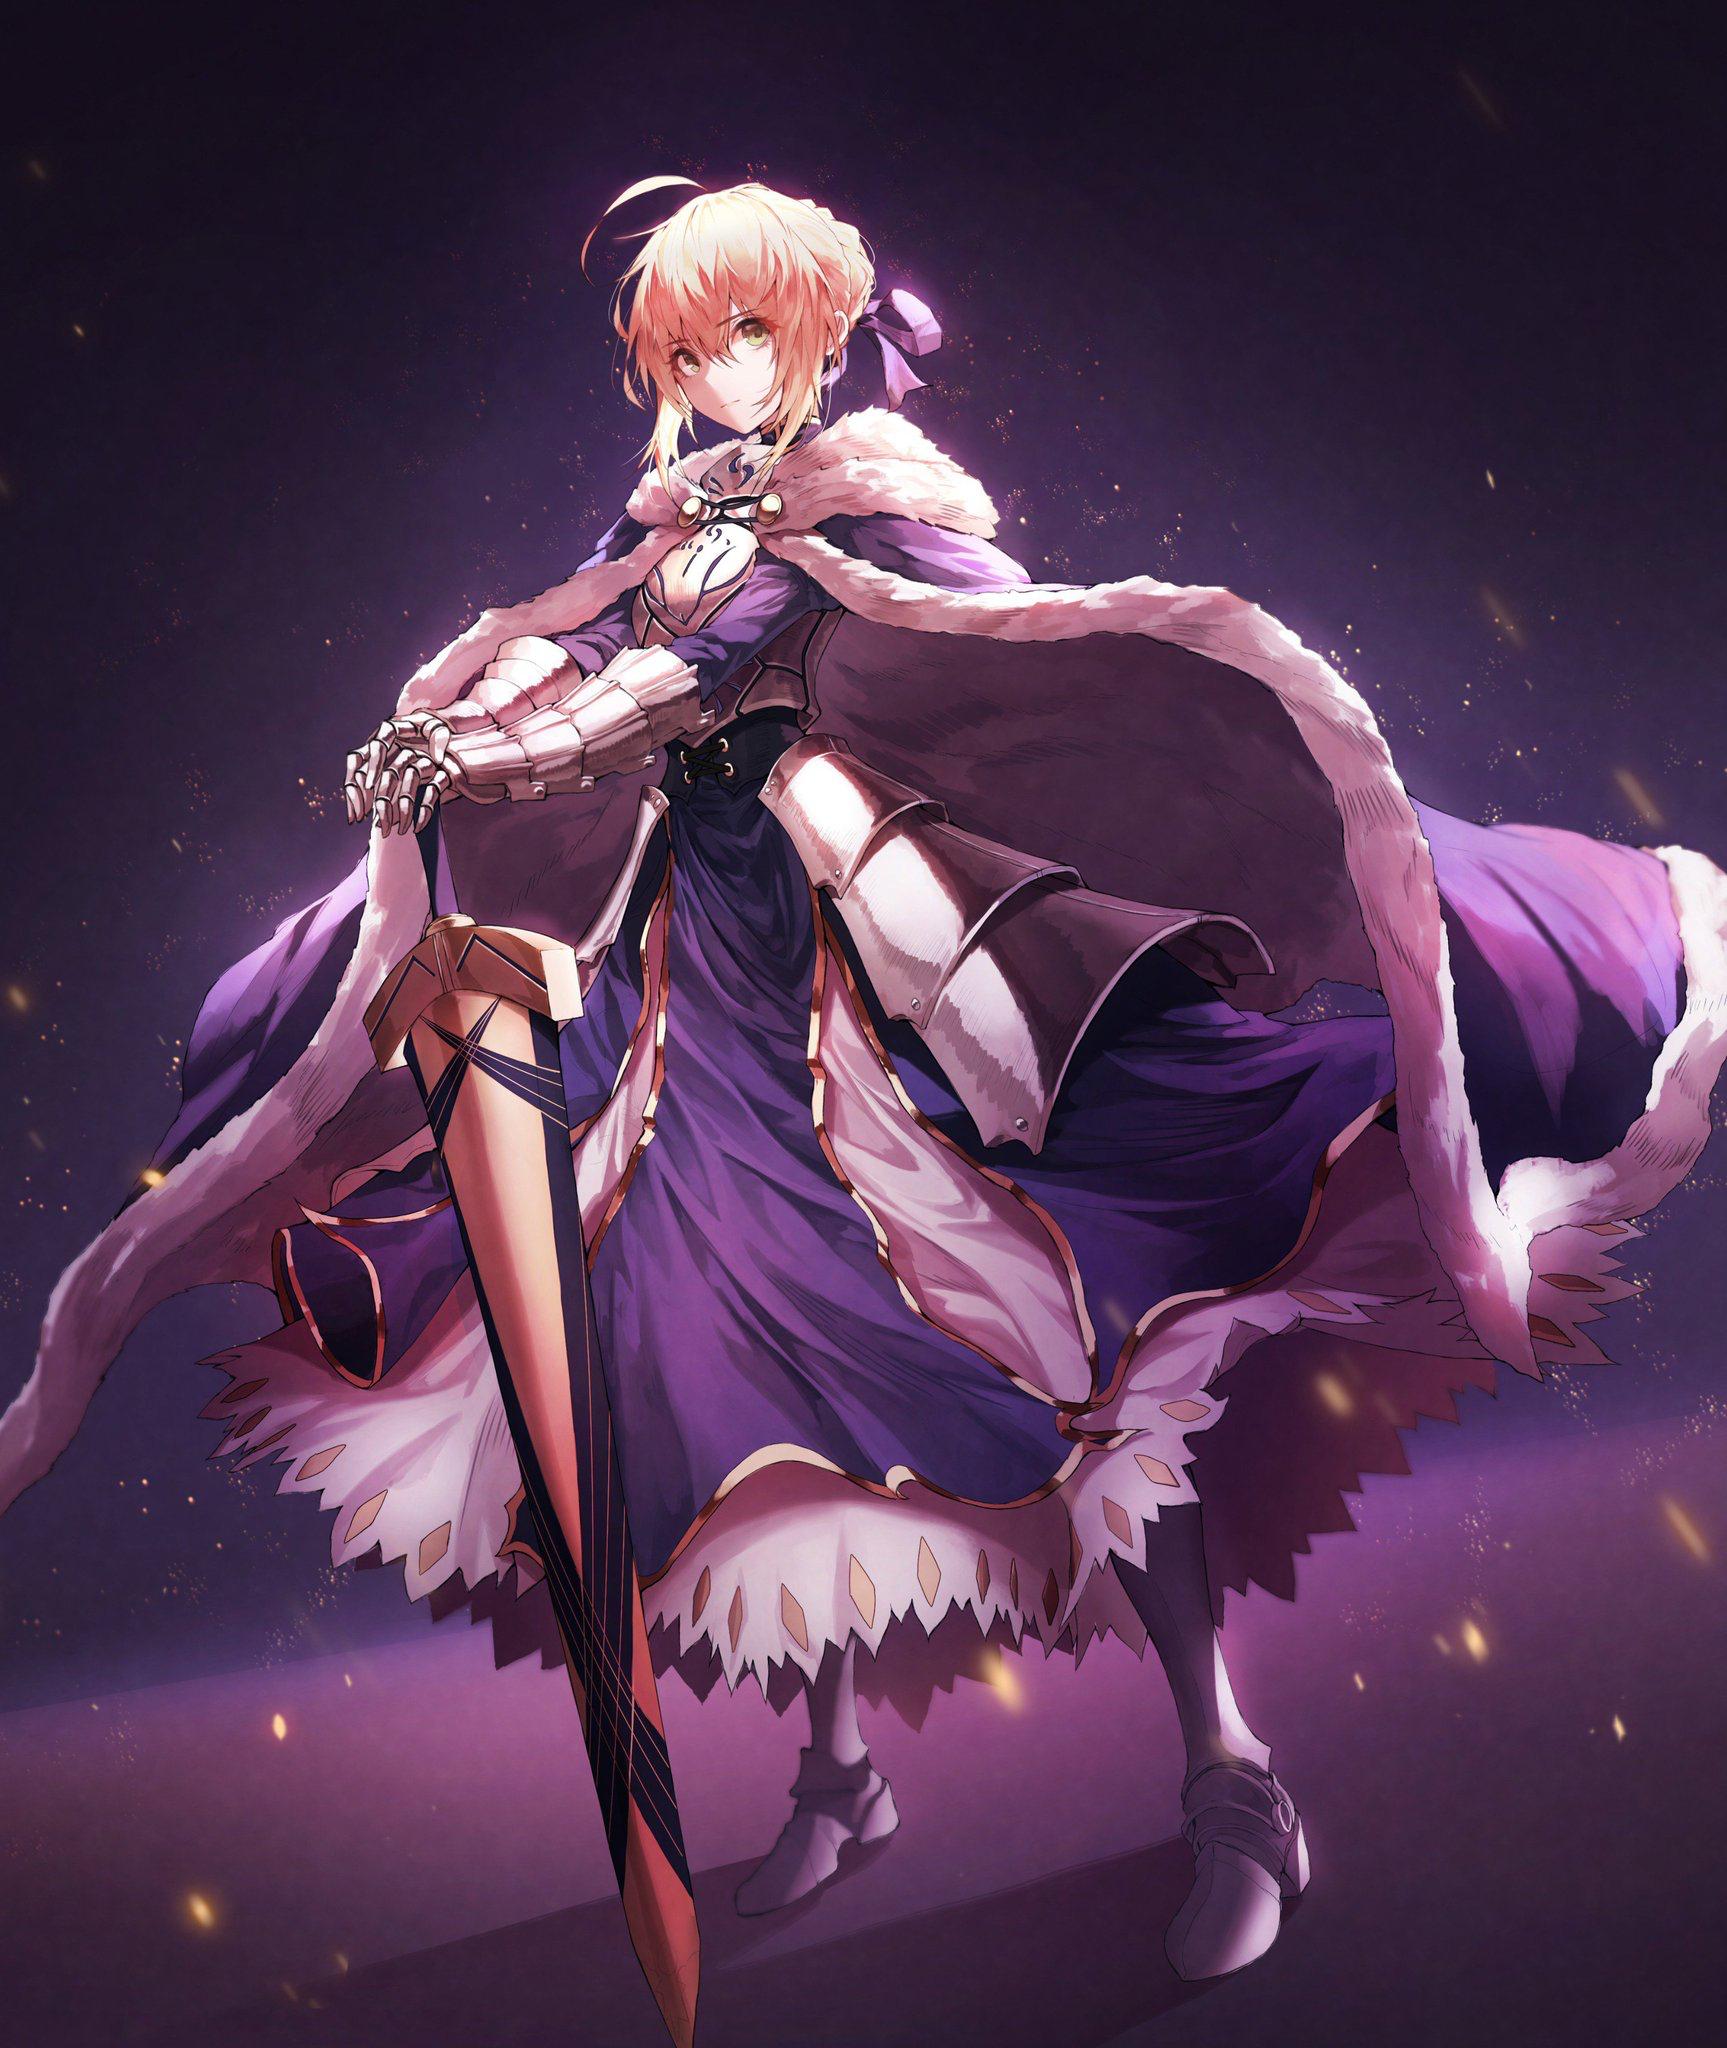 FATE ANIME 【ARTURIA PENDRAGON】 Anime, Fate stay night